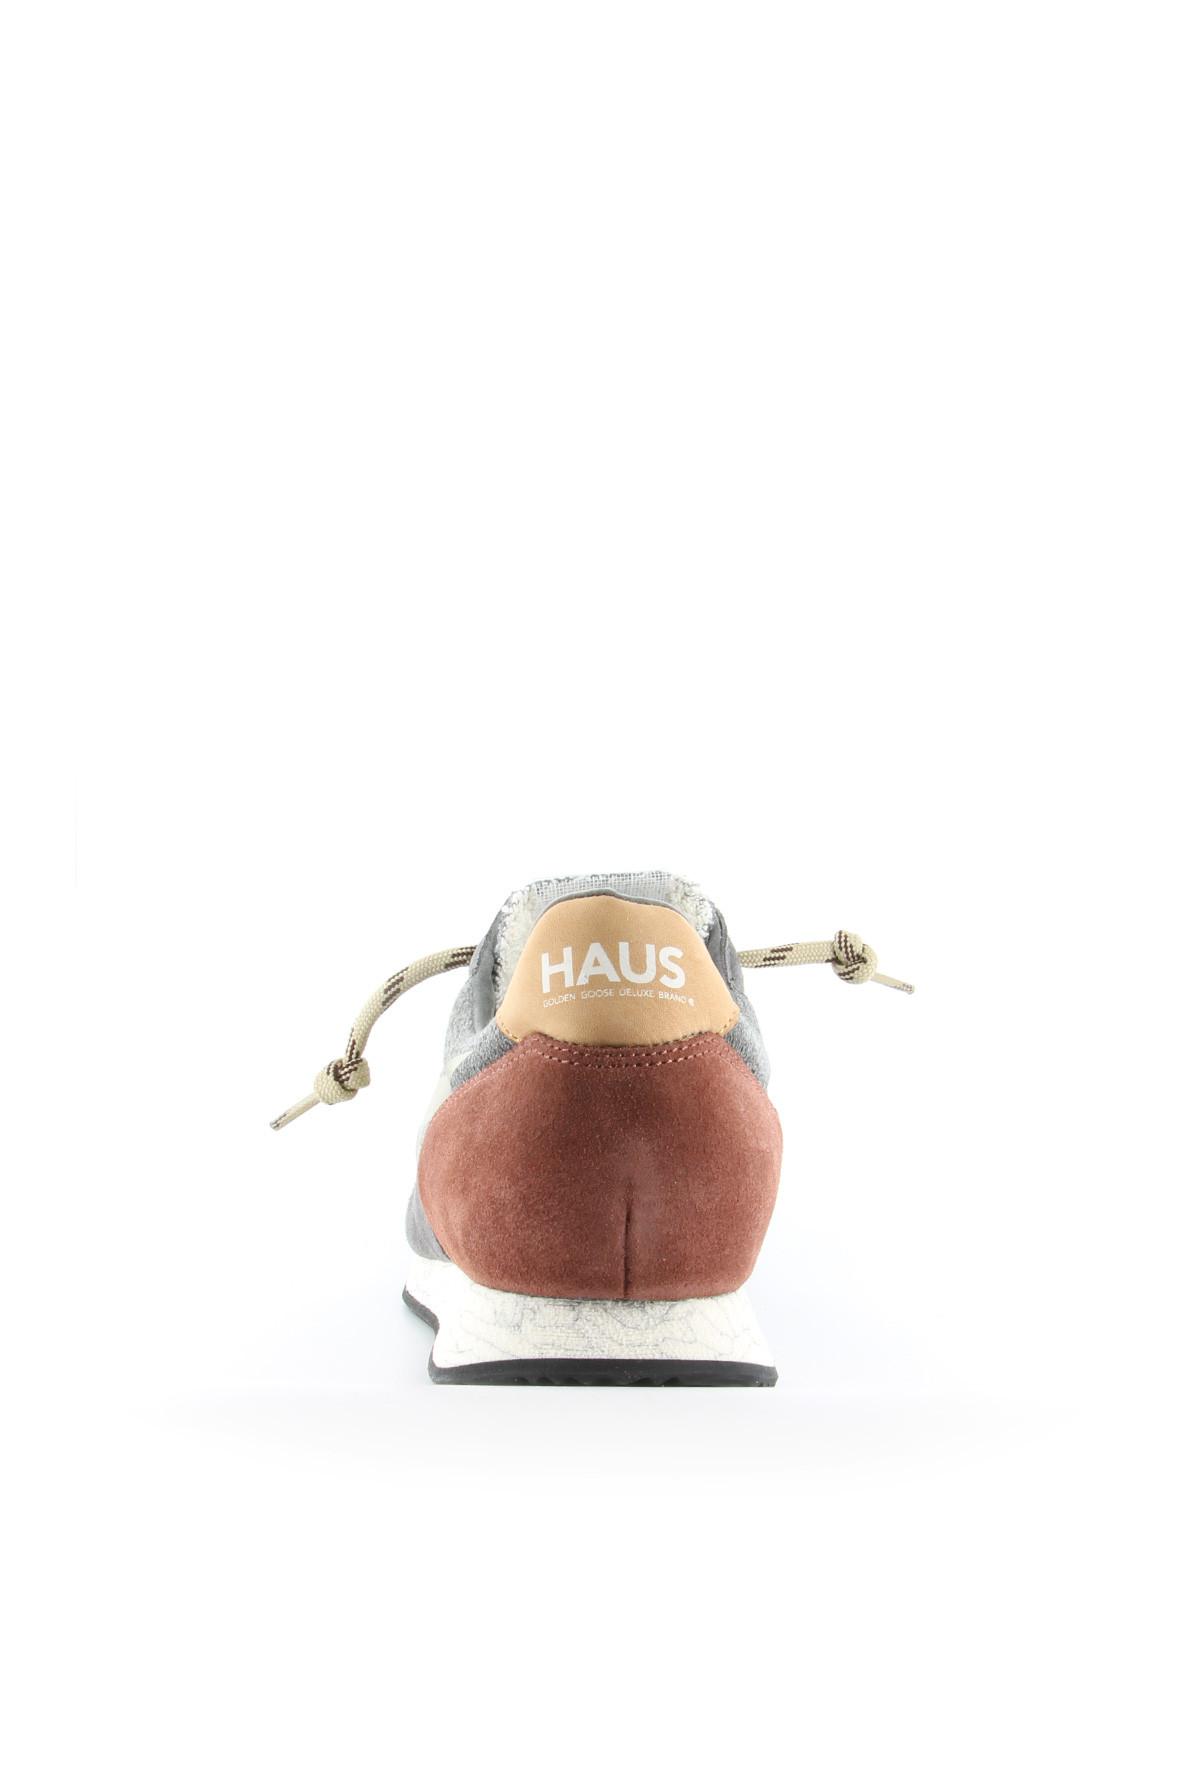 Baskets H31ms368 Neat Grises Golden Haus Goose a2 E9IWDH2Y